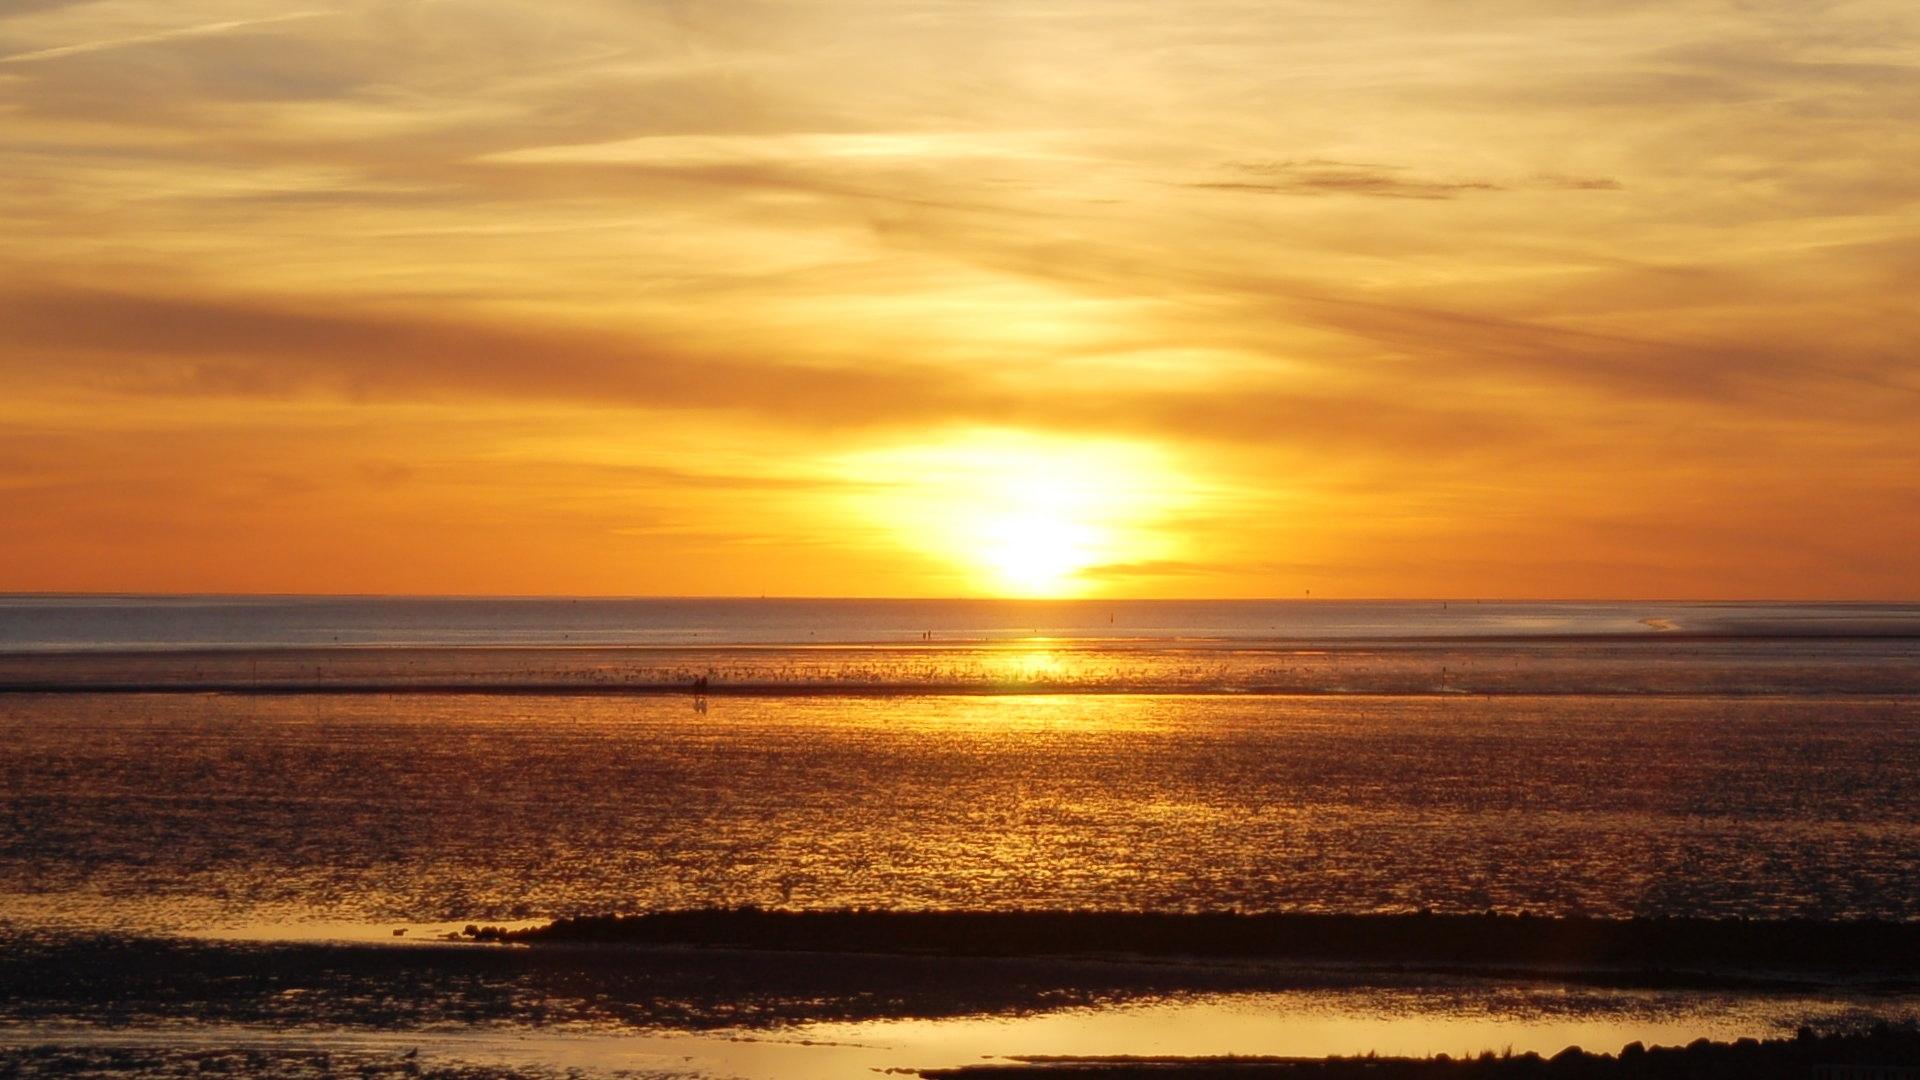 Sonnenuntergang über dem Watt vor Büsum